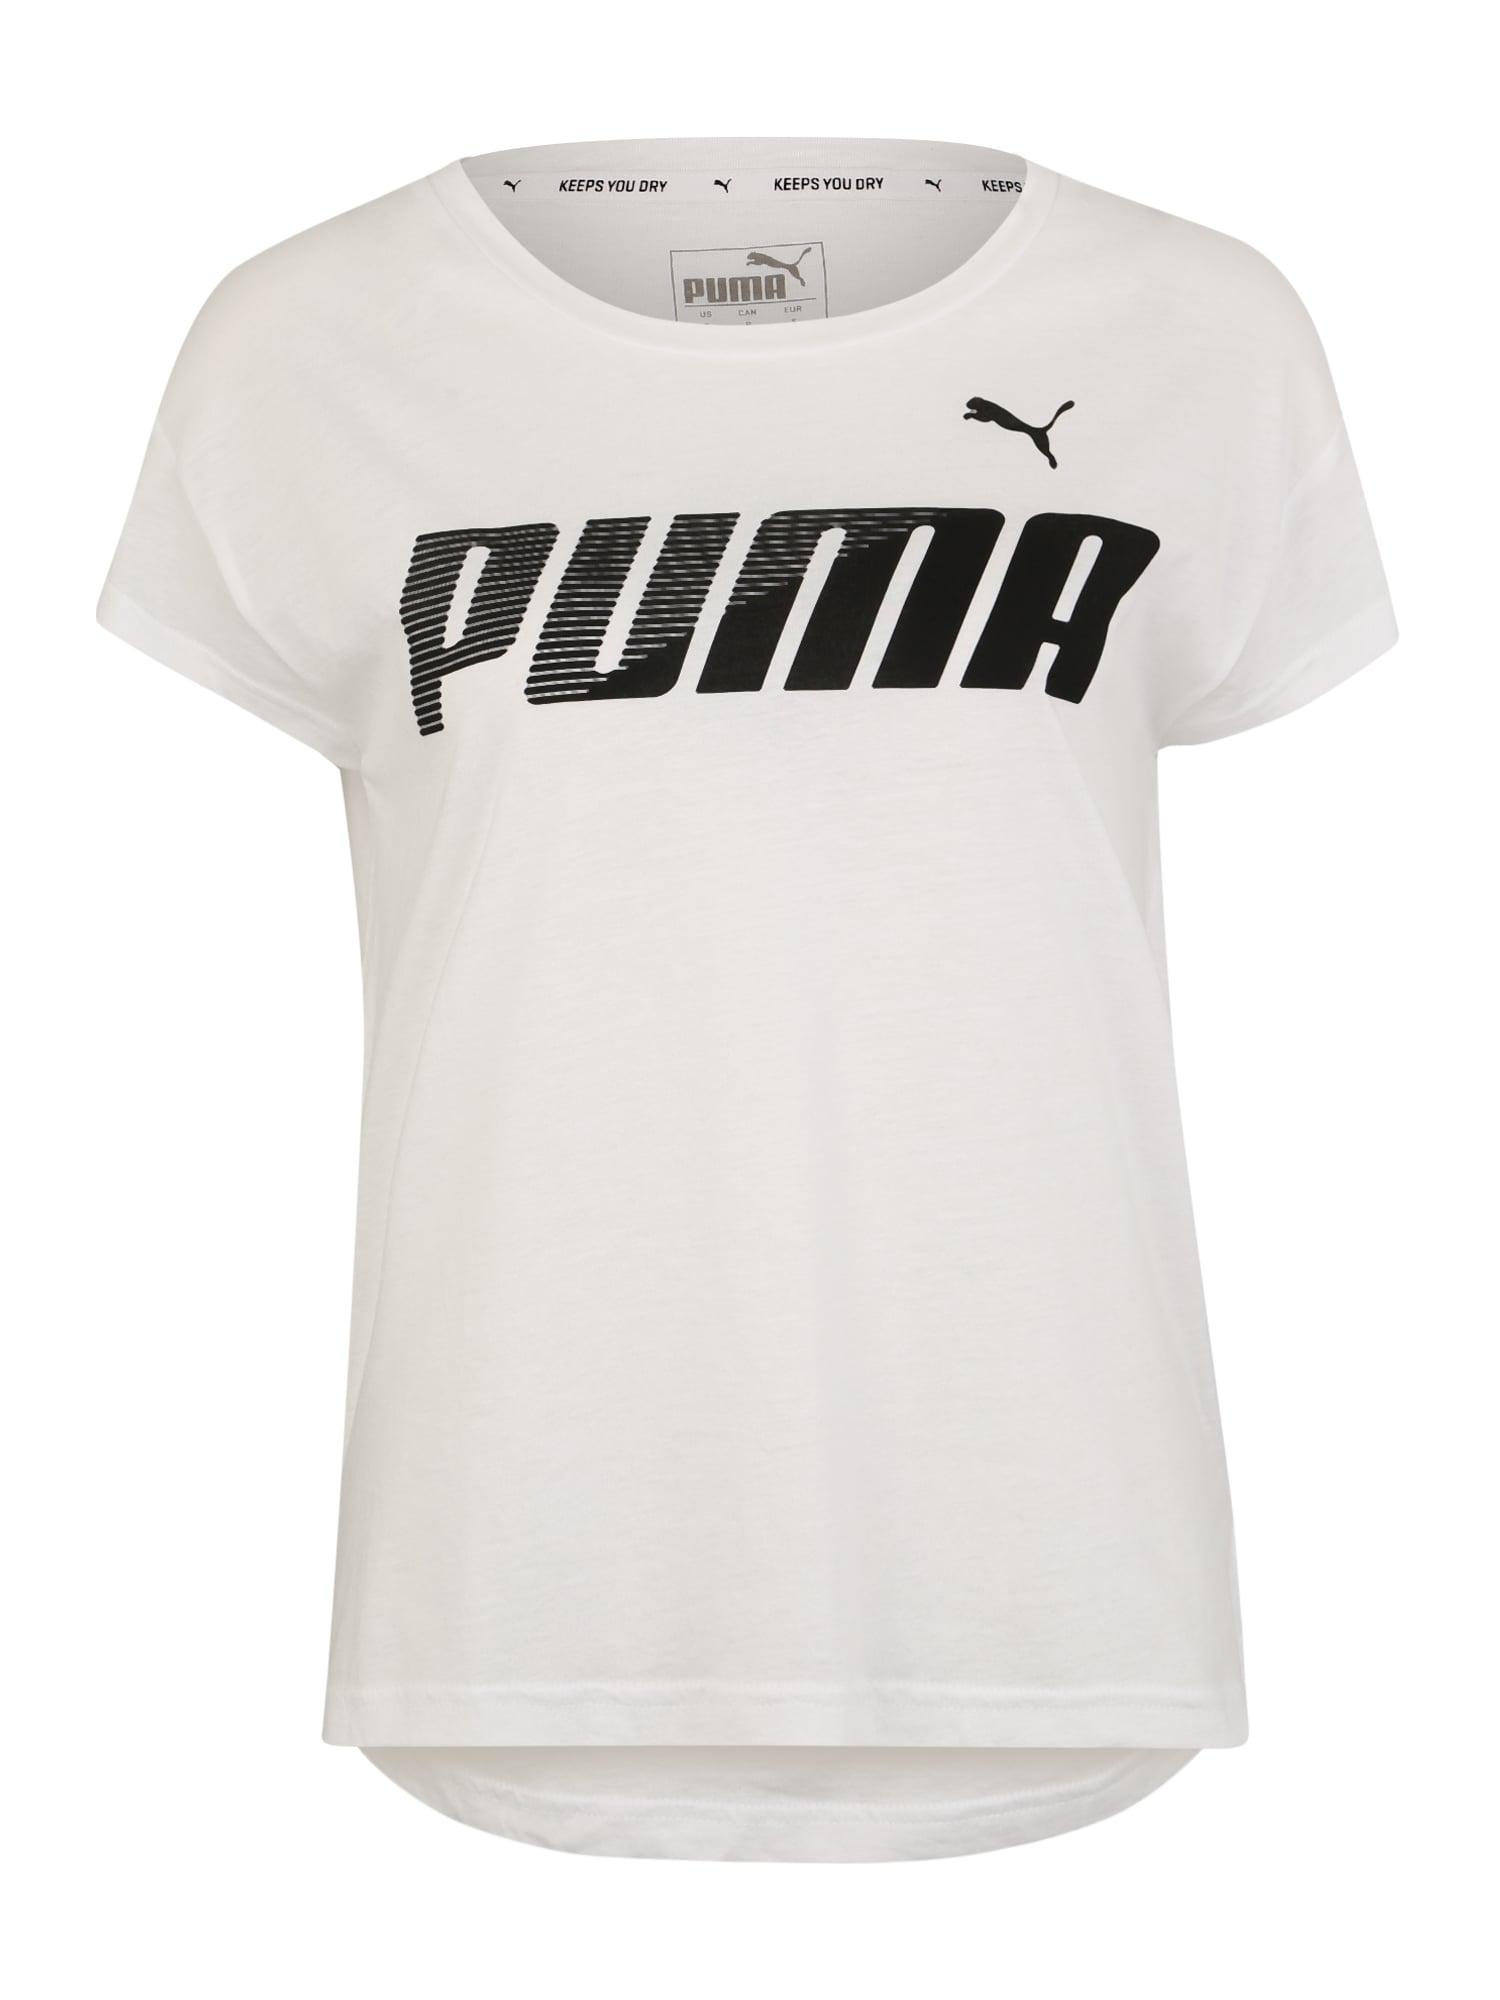 Sport-Shirt 'MODERN SPORT Graphic' | Sportbekleidung > Sportshirts > T-Shirts | Puma